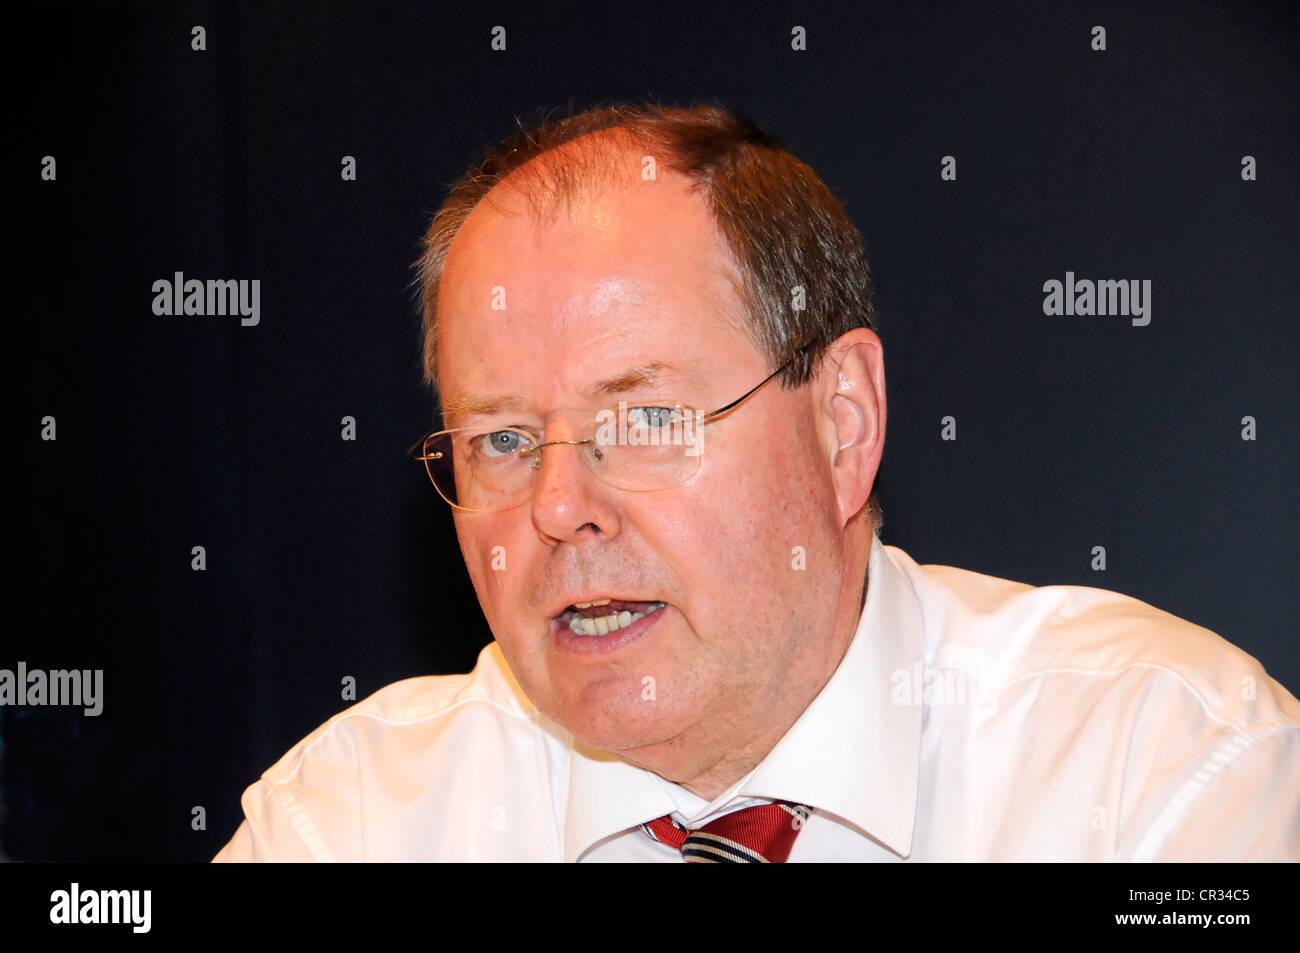 Peer Steinbrueck, member of Parliament, SPD, social democratic party, Germany, Europe - Stock Image